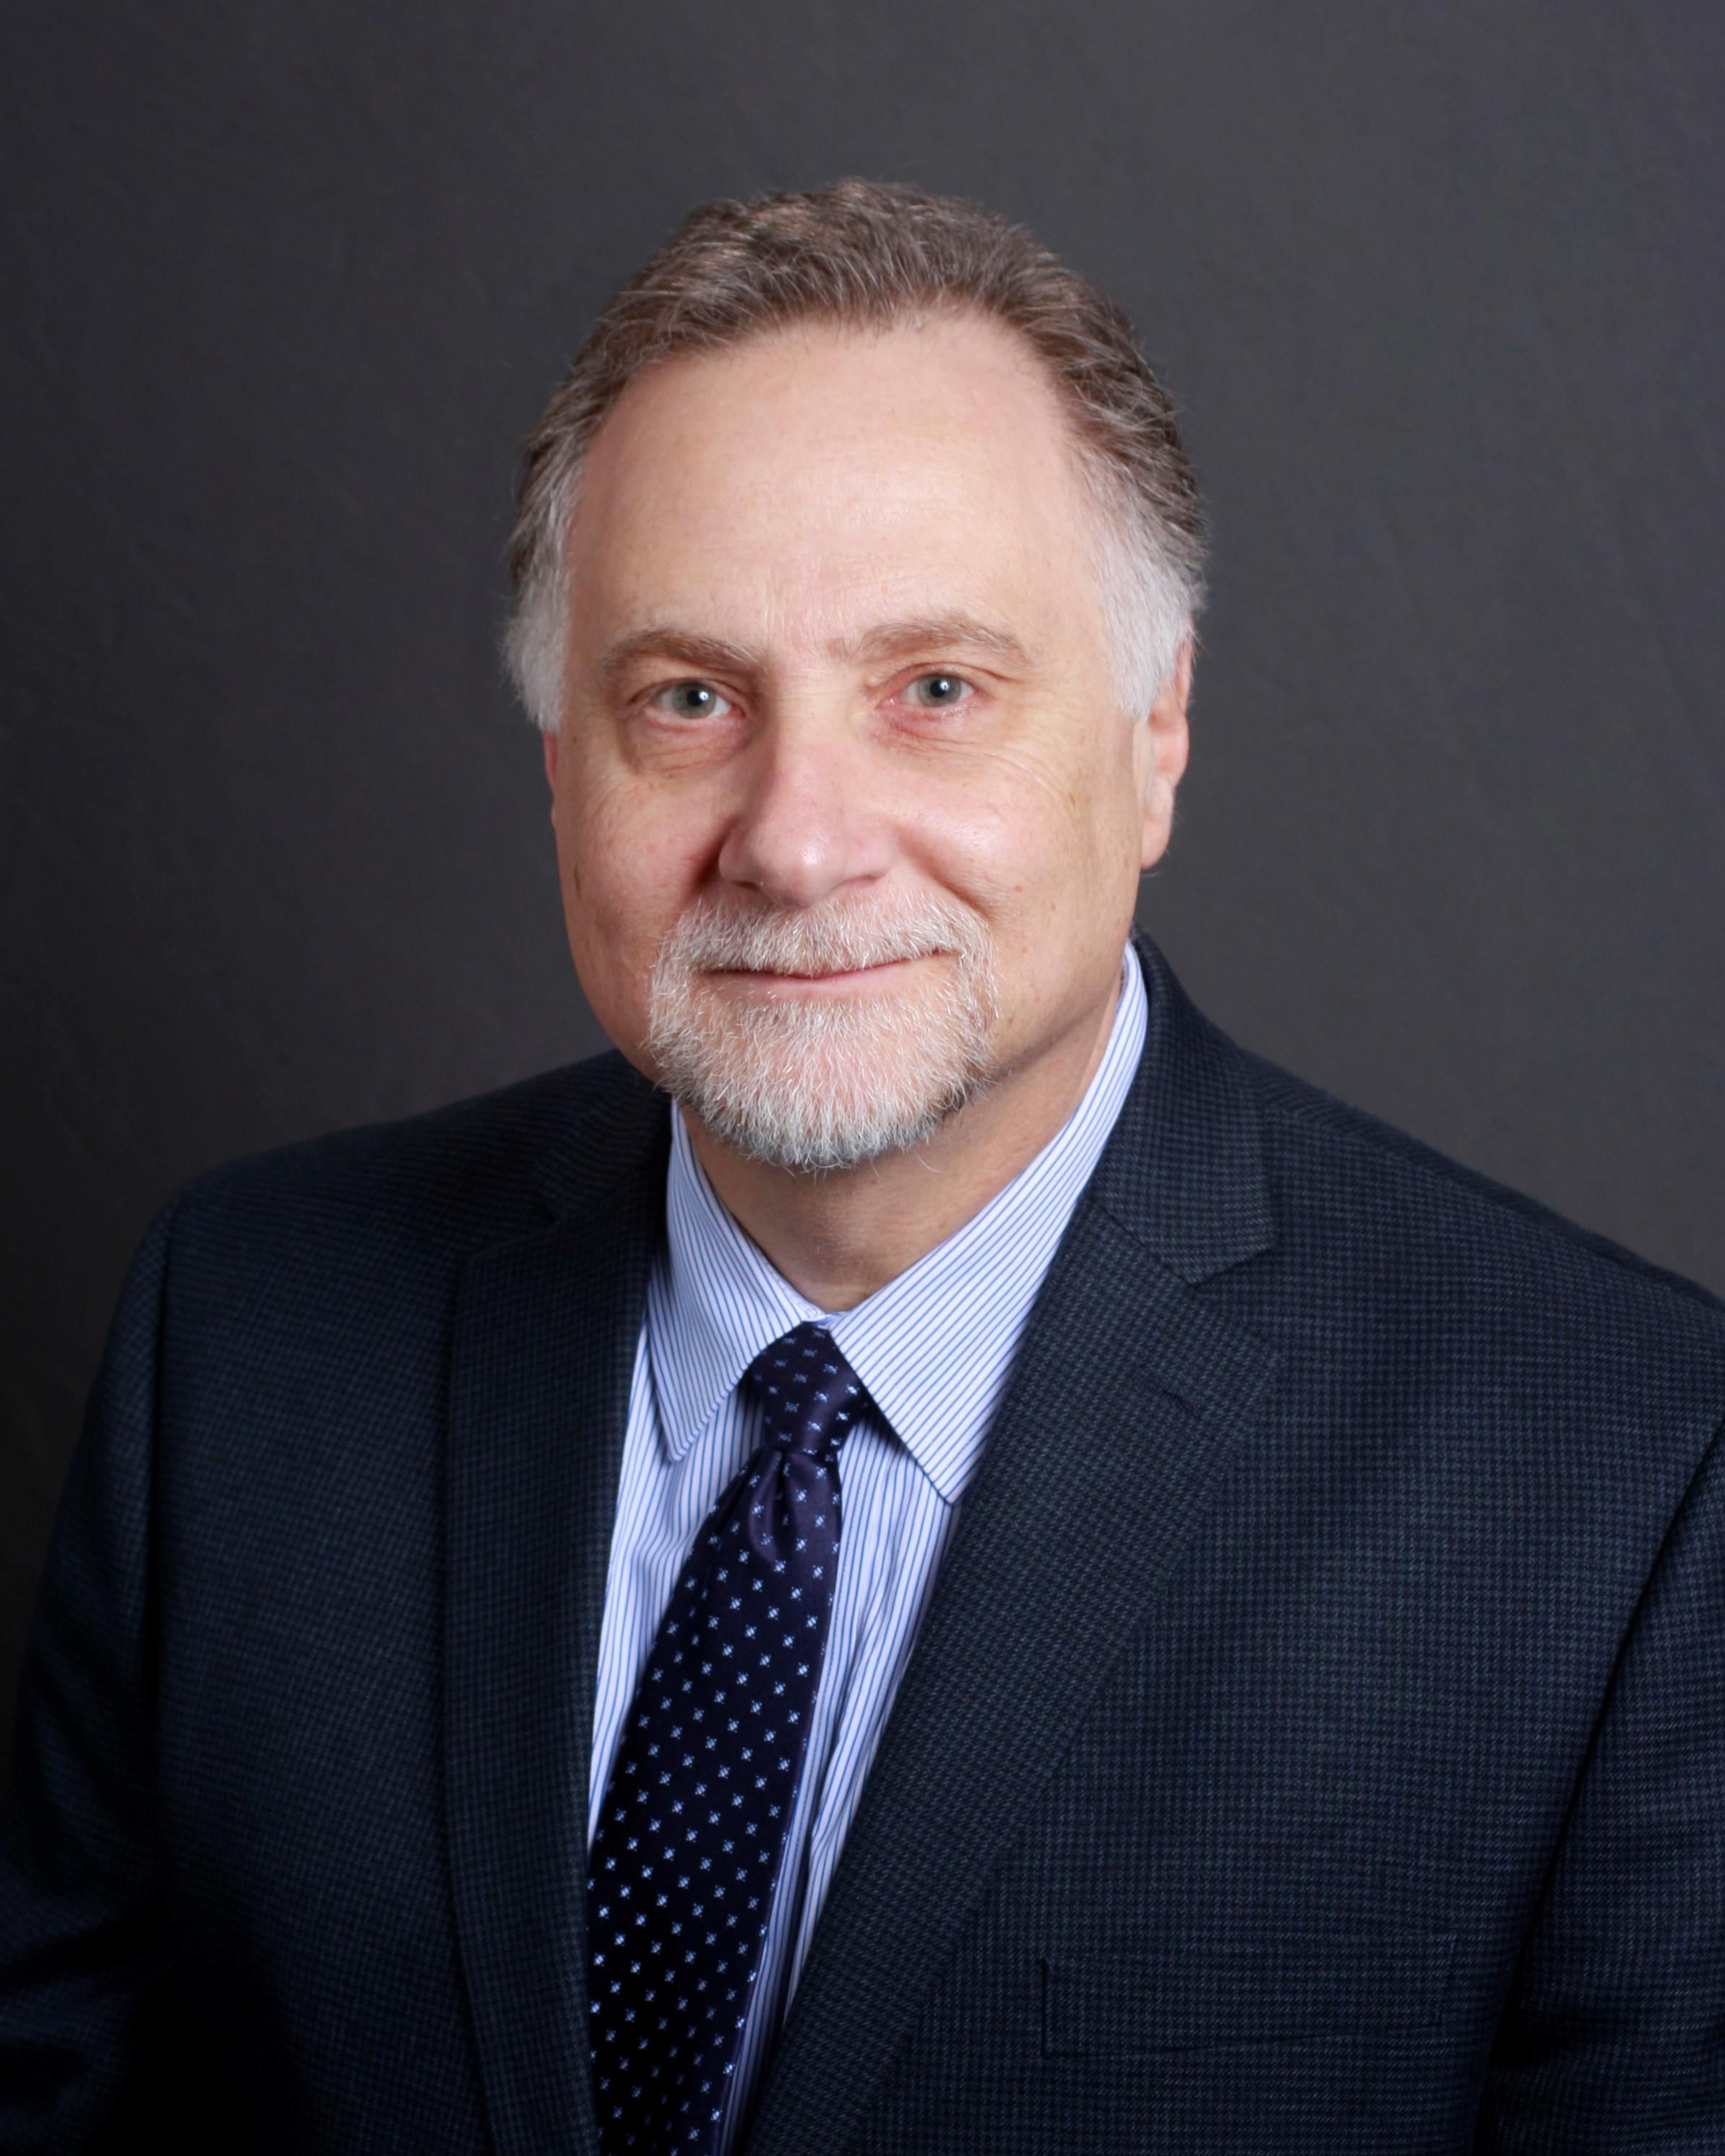 Daniel H. Mathalon, Ph.D., M.D.